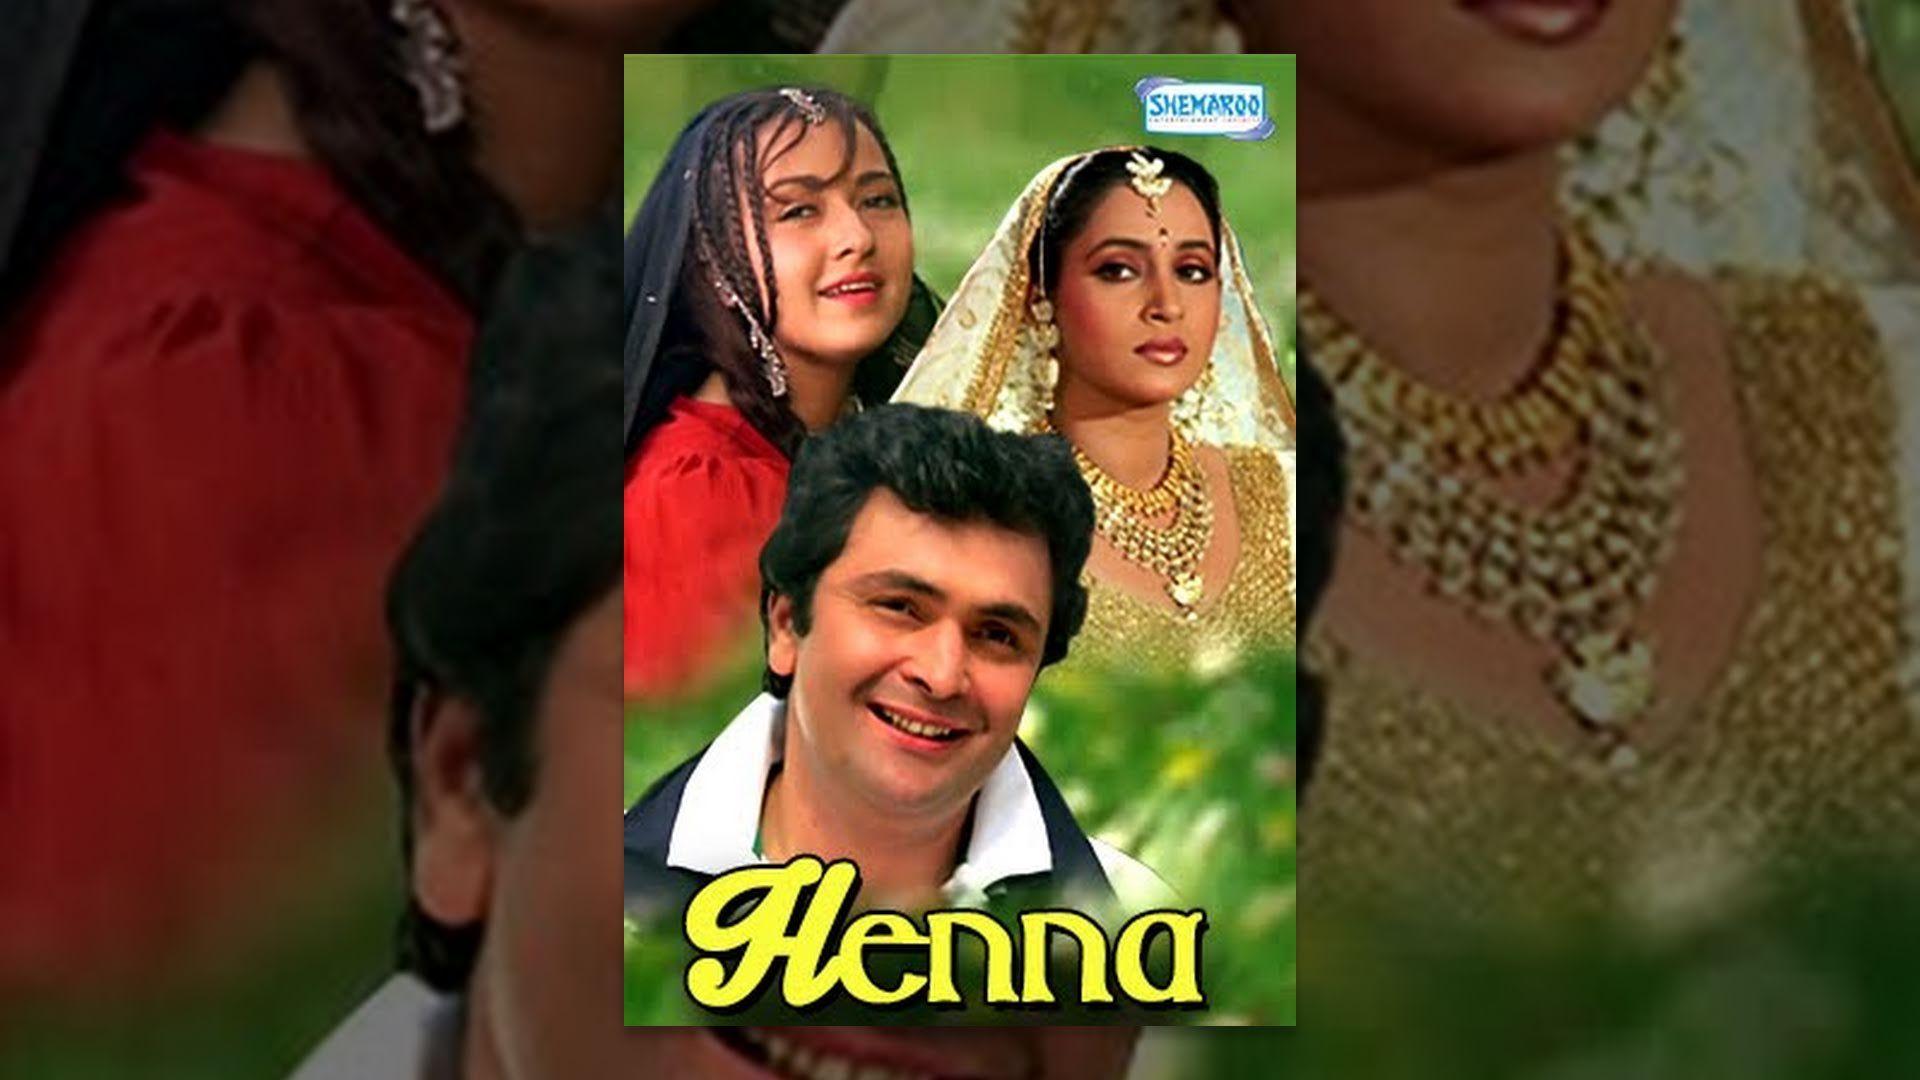 Contact Support Hindi Movies Online Hindi Movies Genius Movie